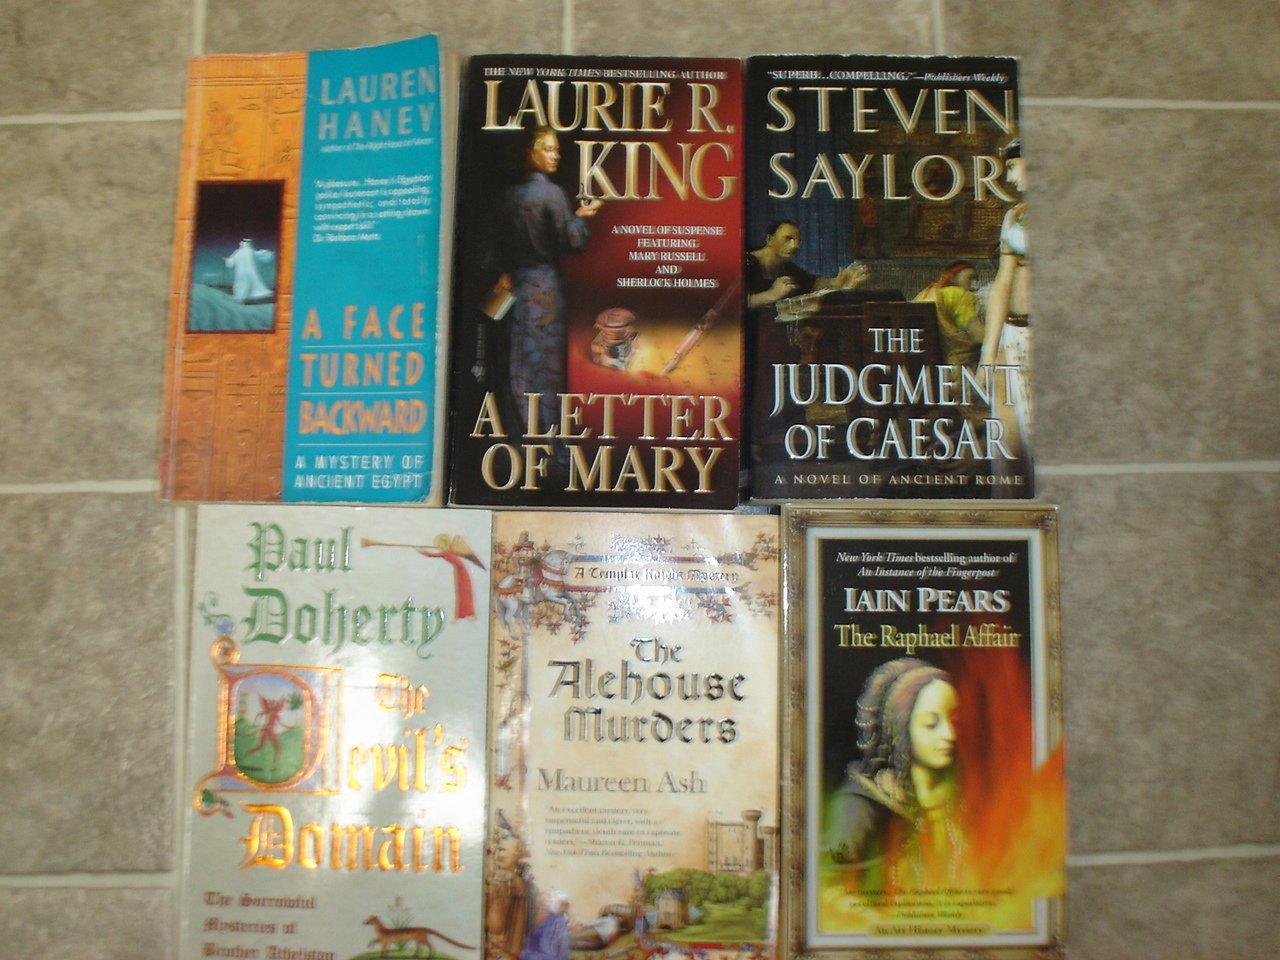 Make Your Own Historical Mystery sampler lot of 5 pb books